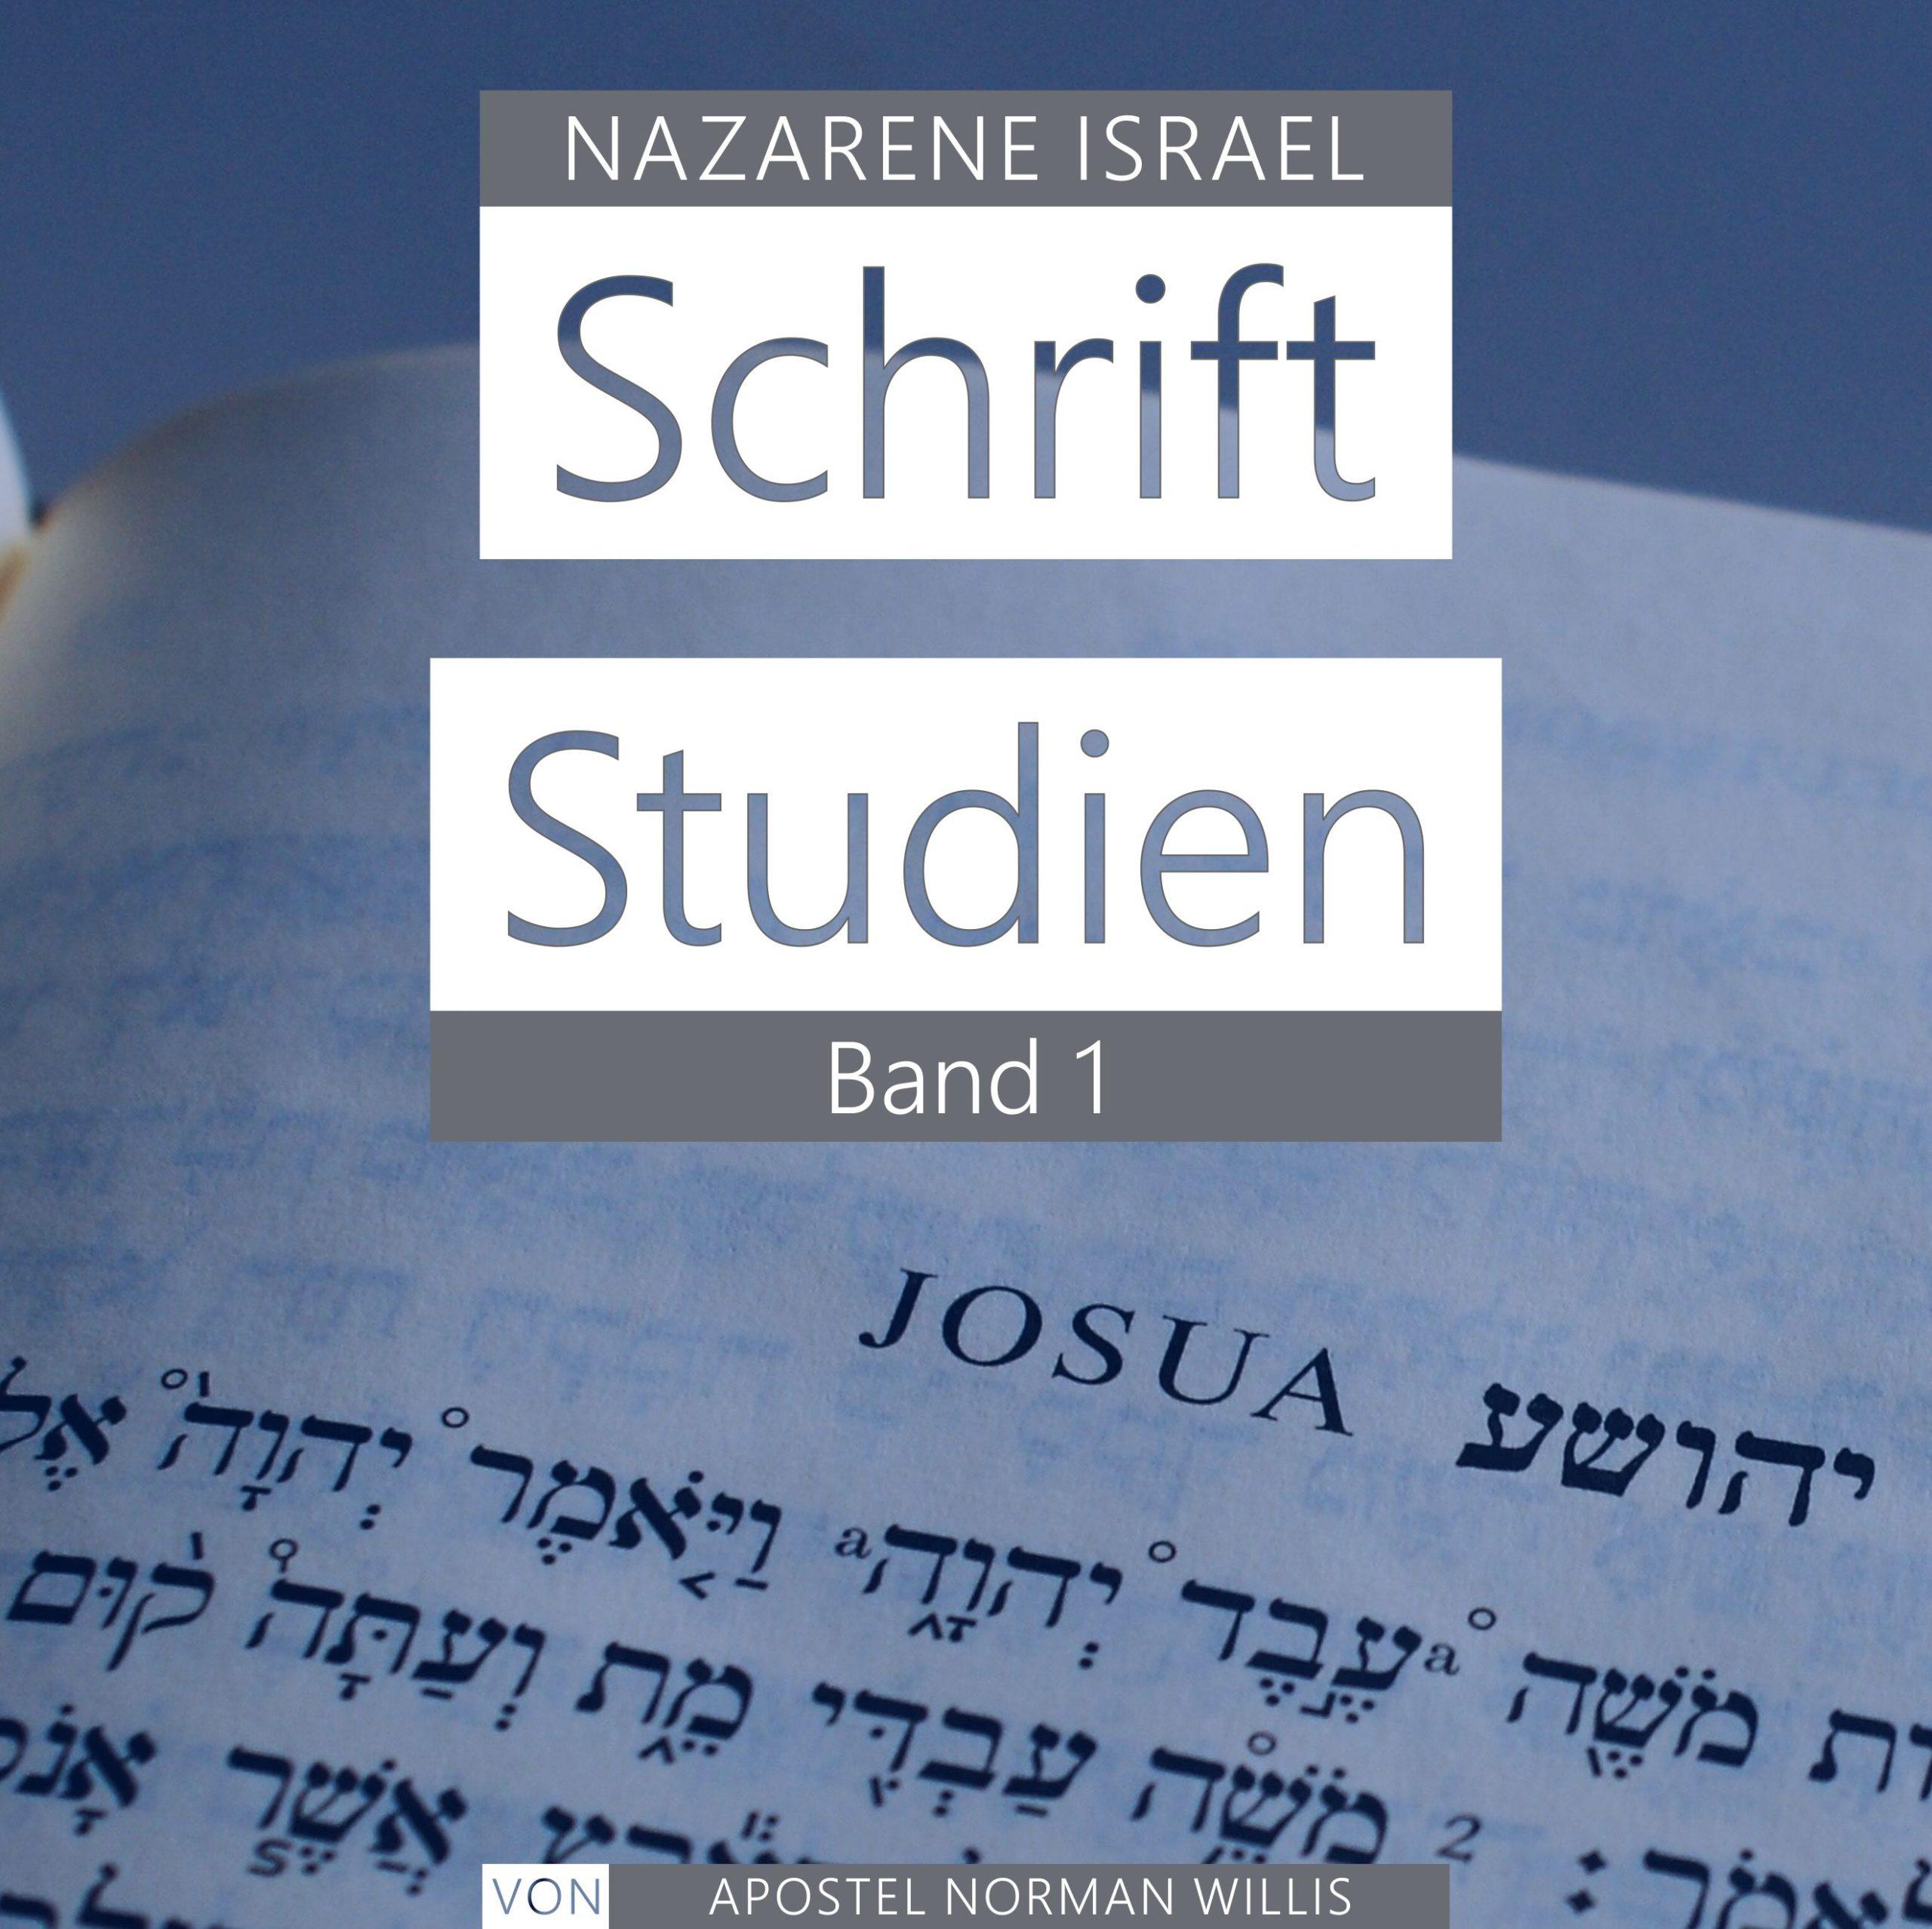 Nazarene Schrift Studien Band 1